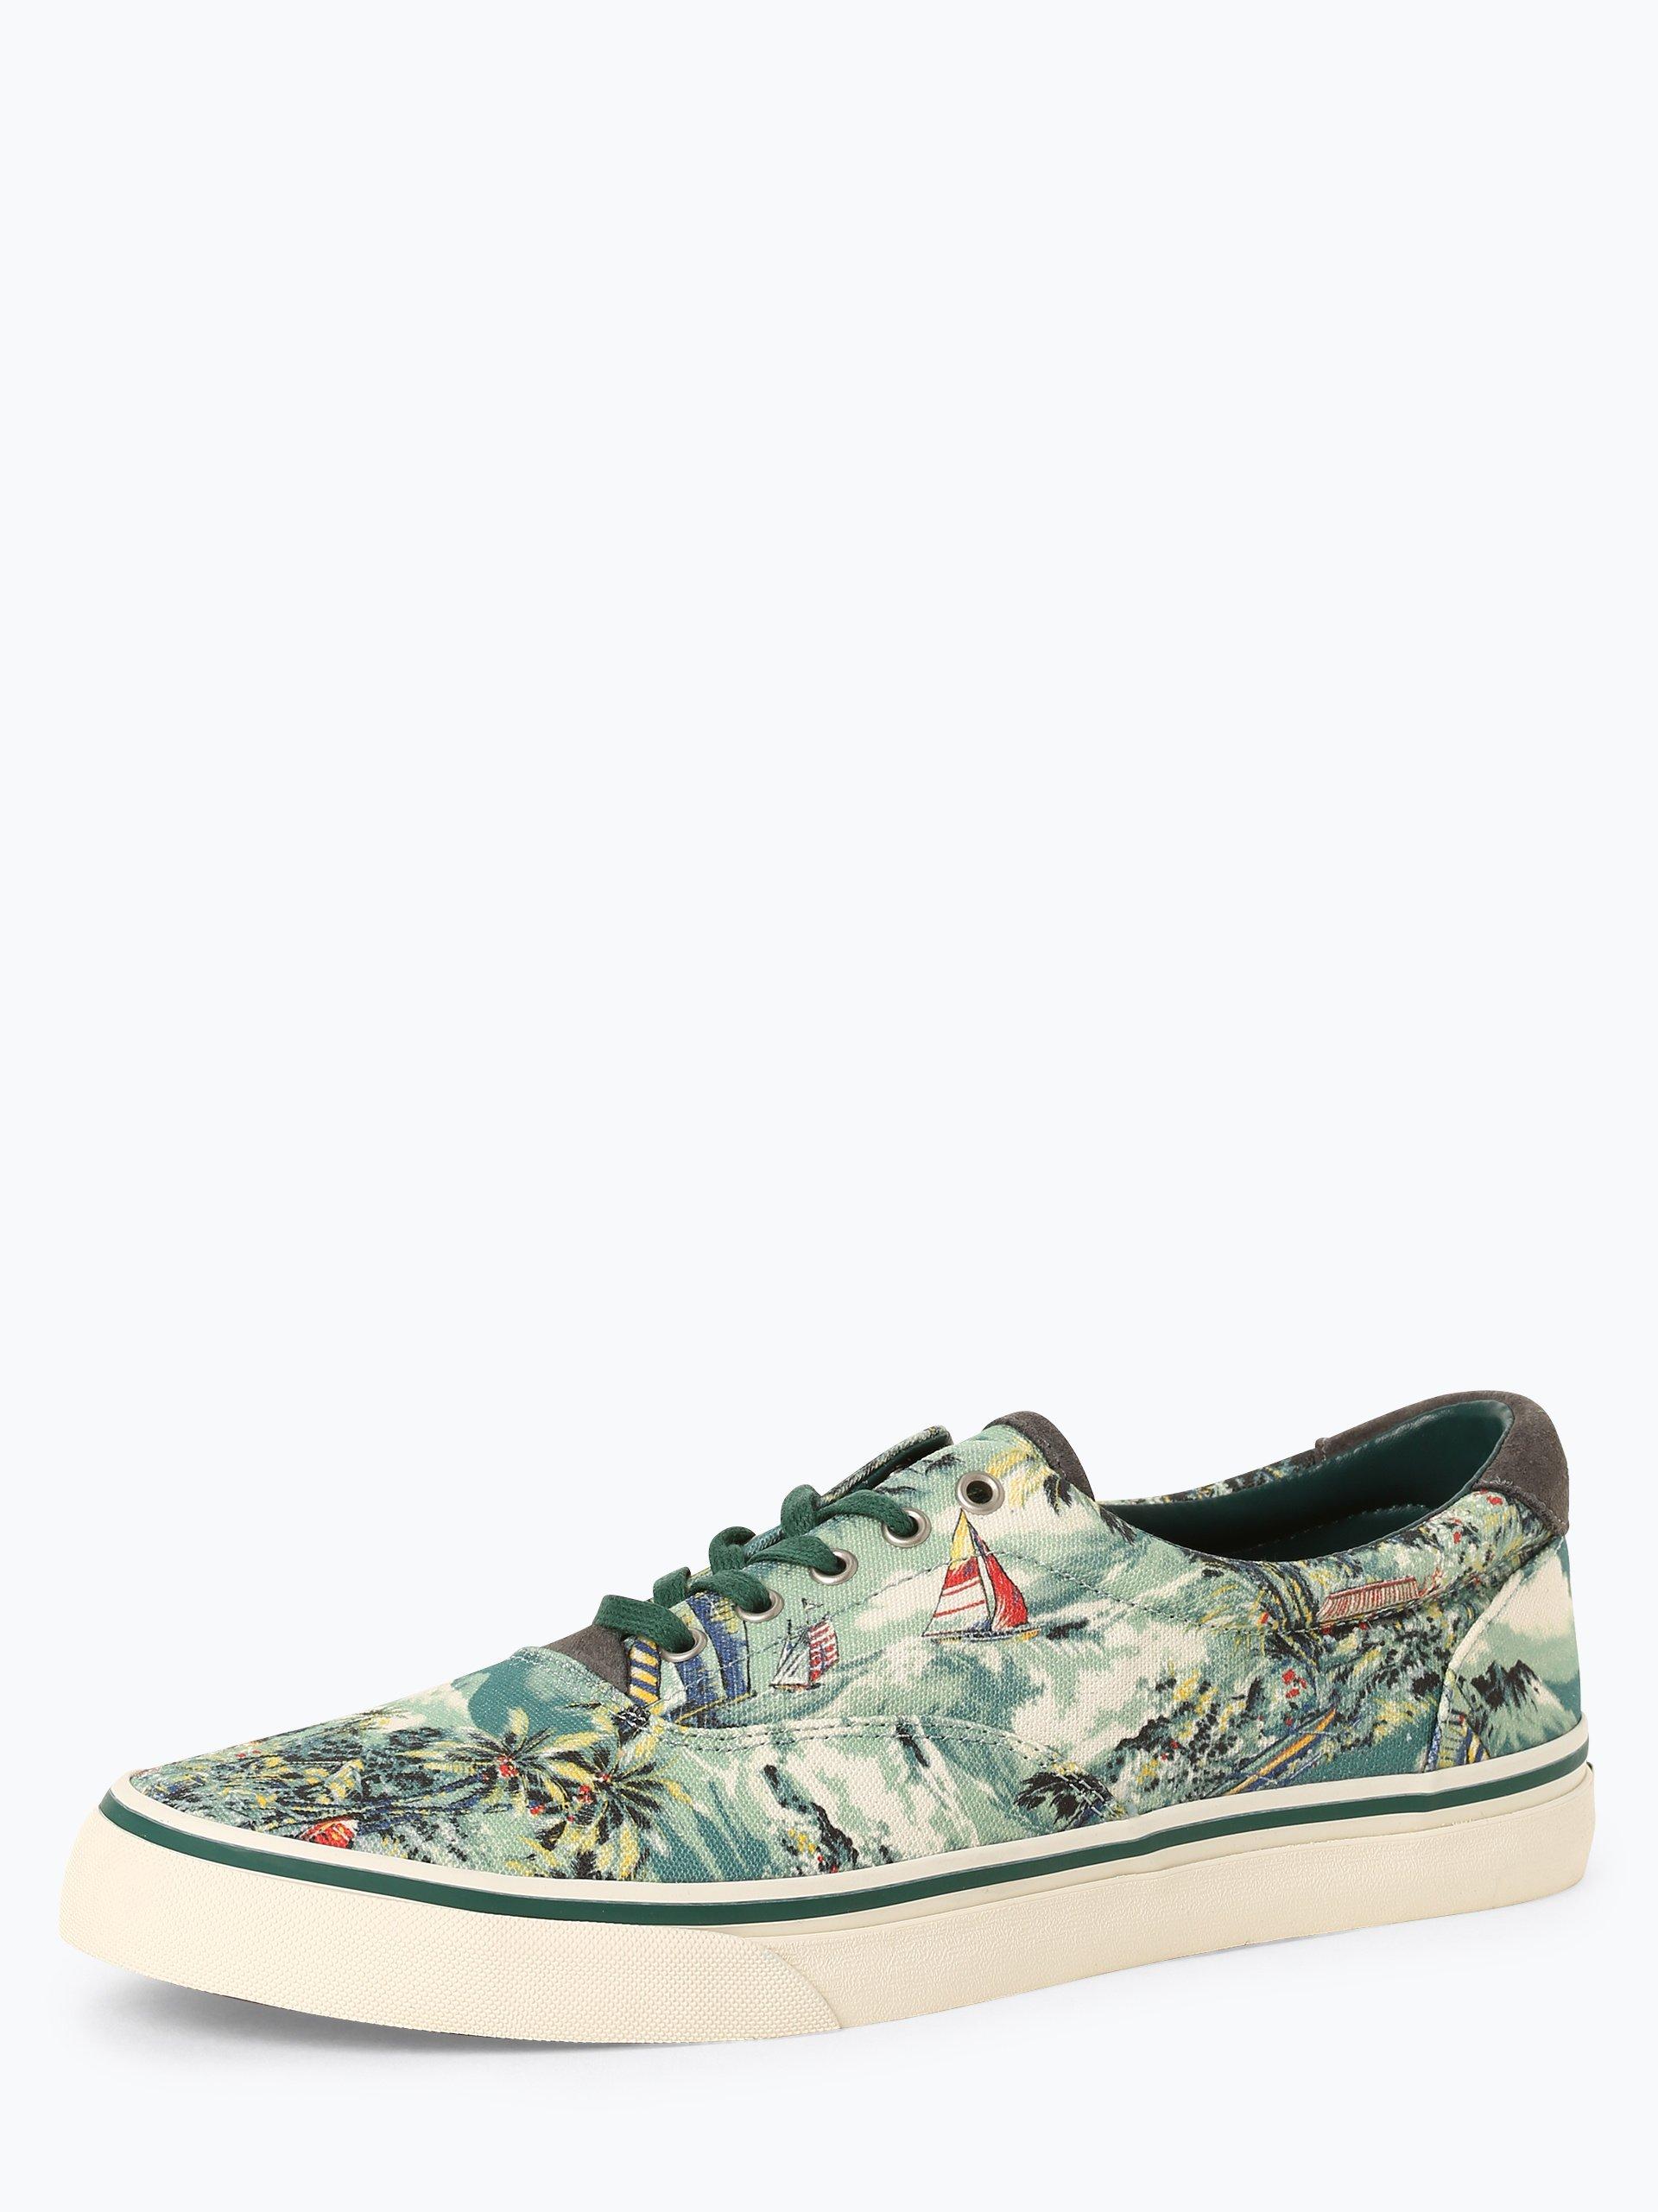 Polo Ralph Lauren Herren Sneaker mit Leder-Anteil - Thorton